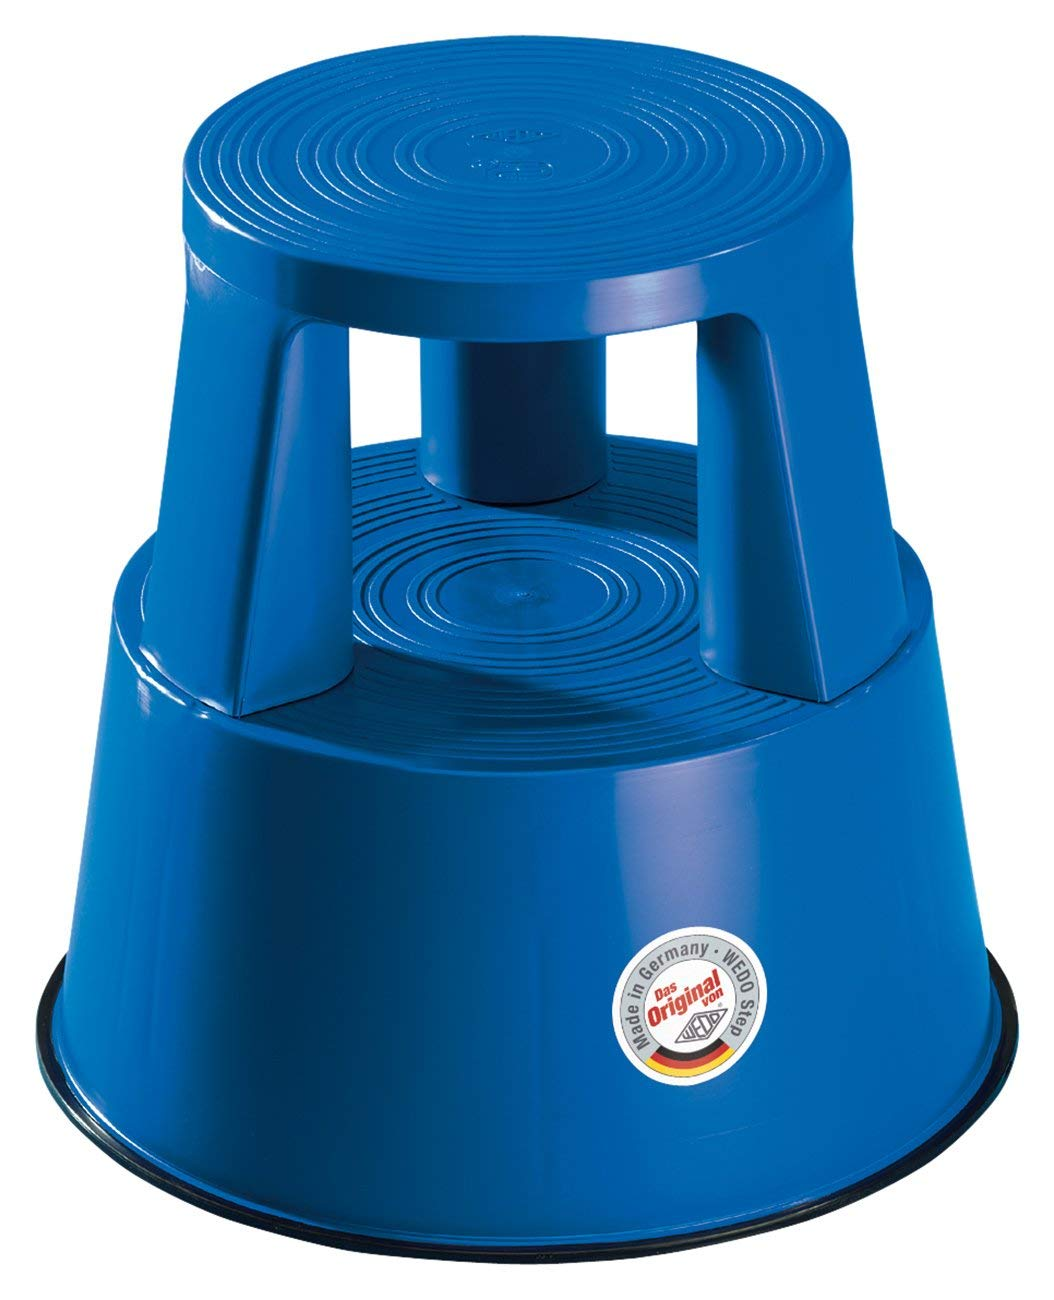 Wedo 212 203 Plastic Kickstool, Blue Werner Dorsch 212203